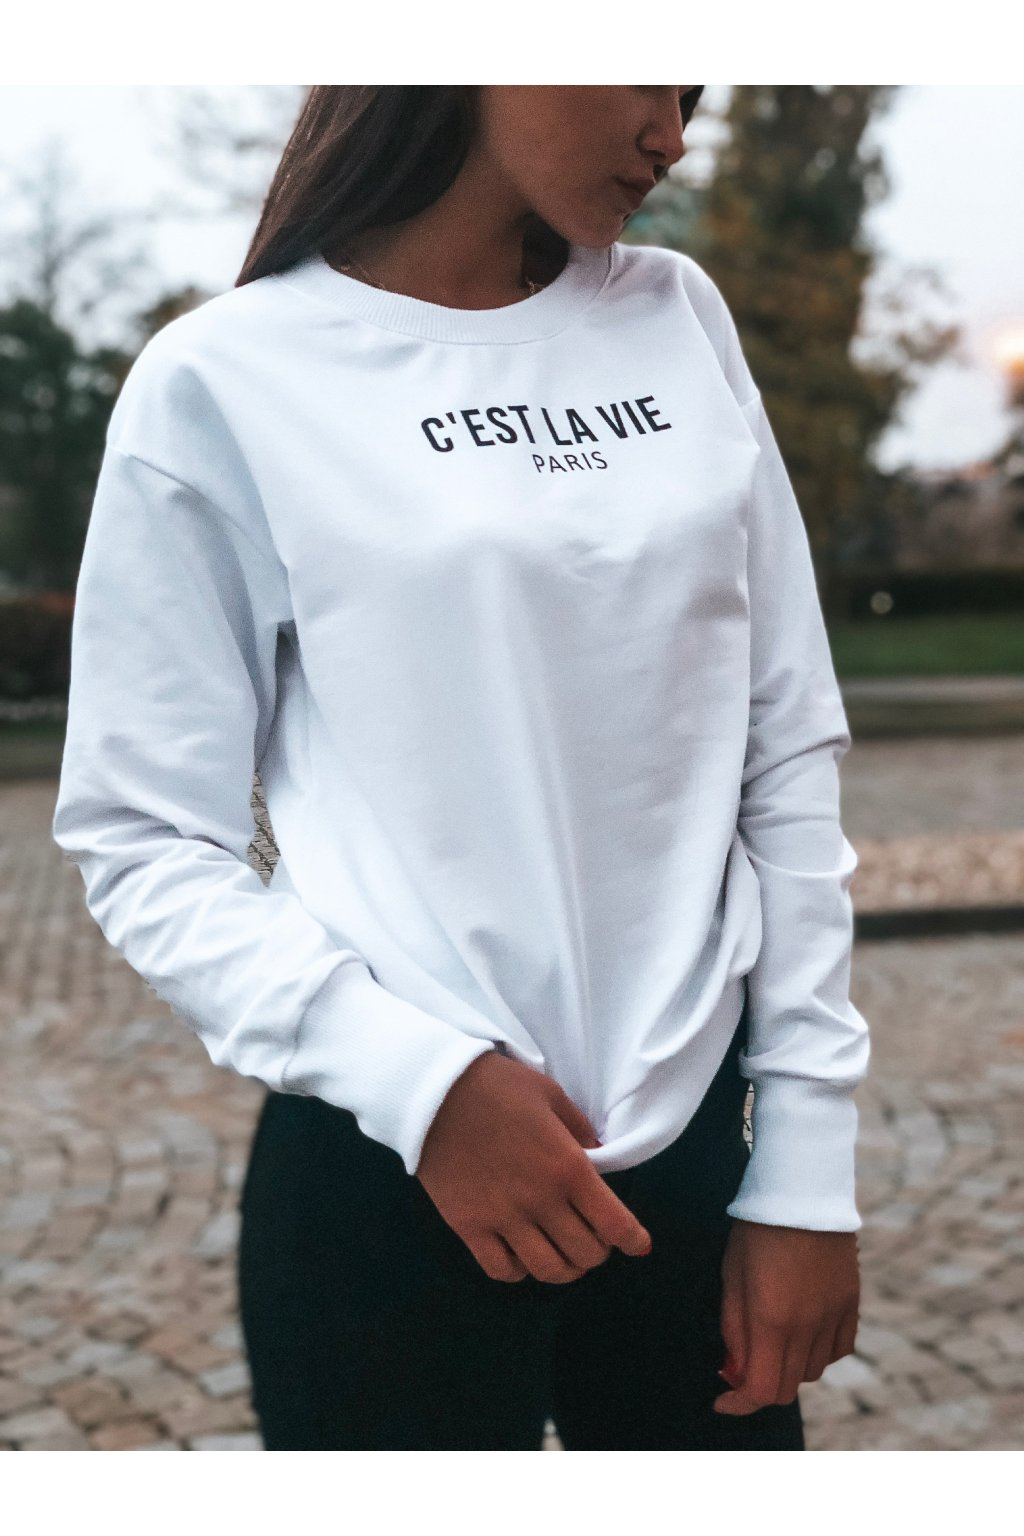 damska mikina c est la vie paris white eshopat cz 1